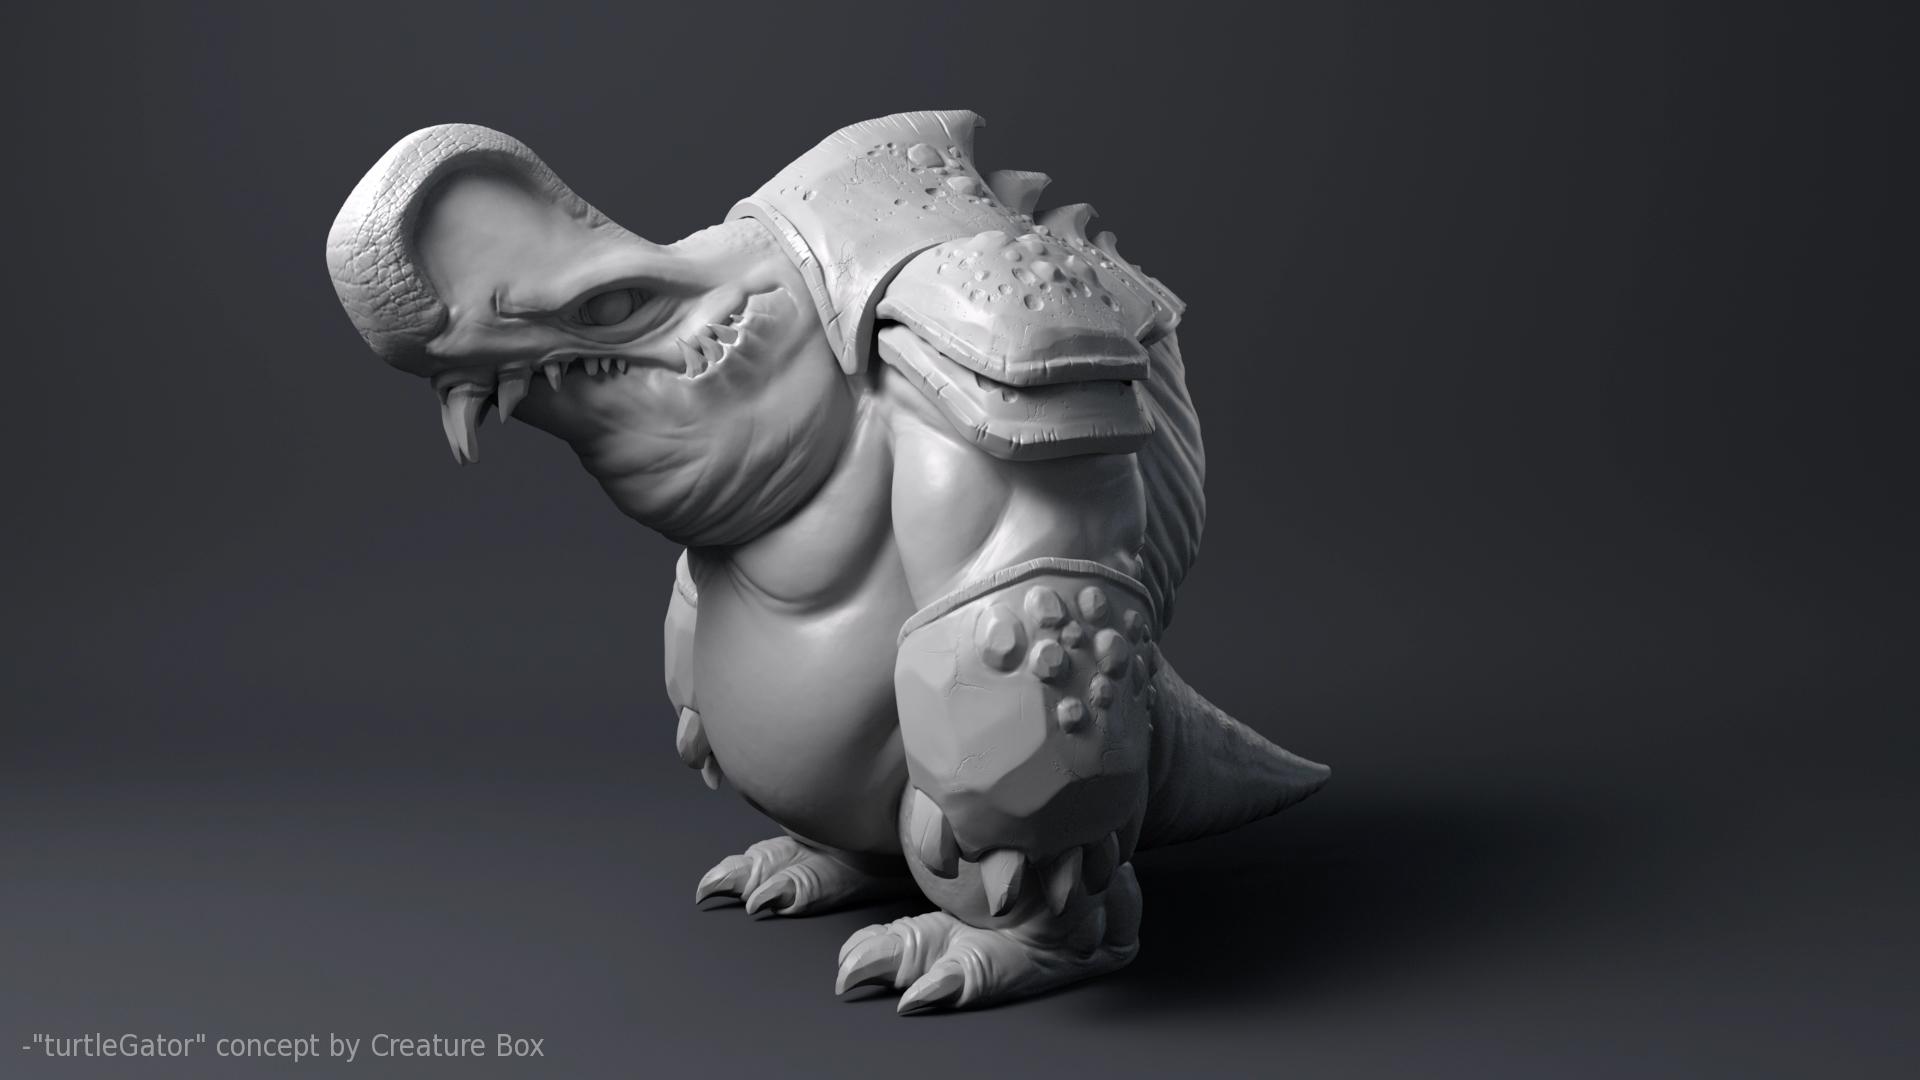 turtlegator01.jpg